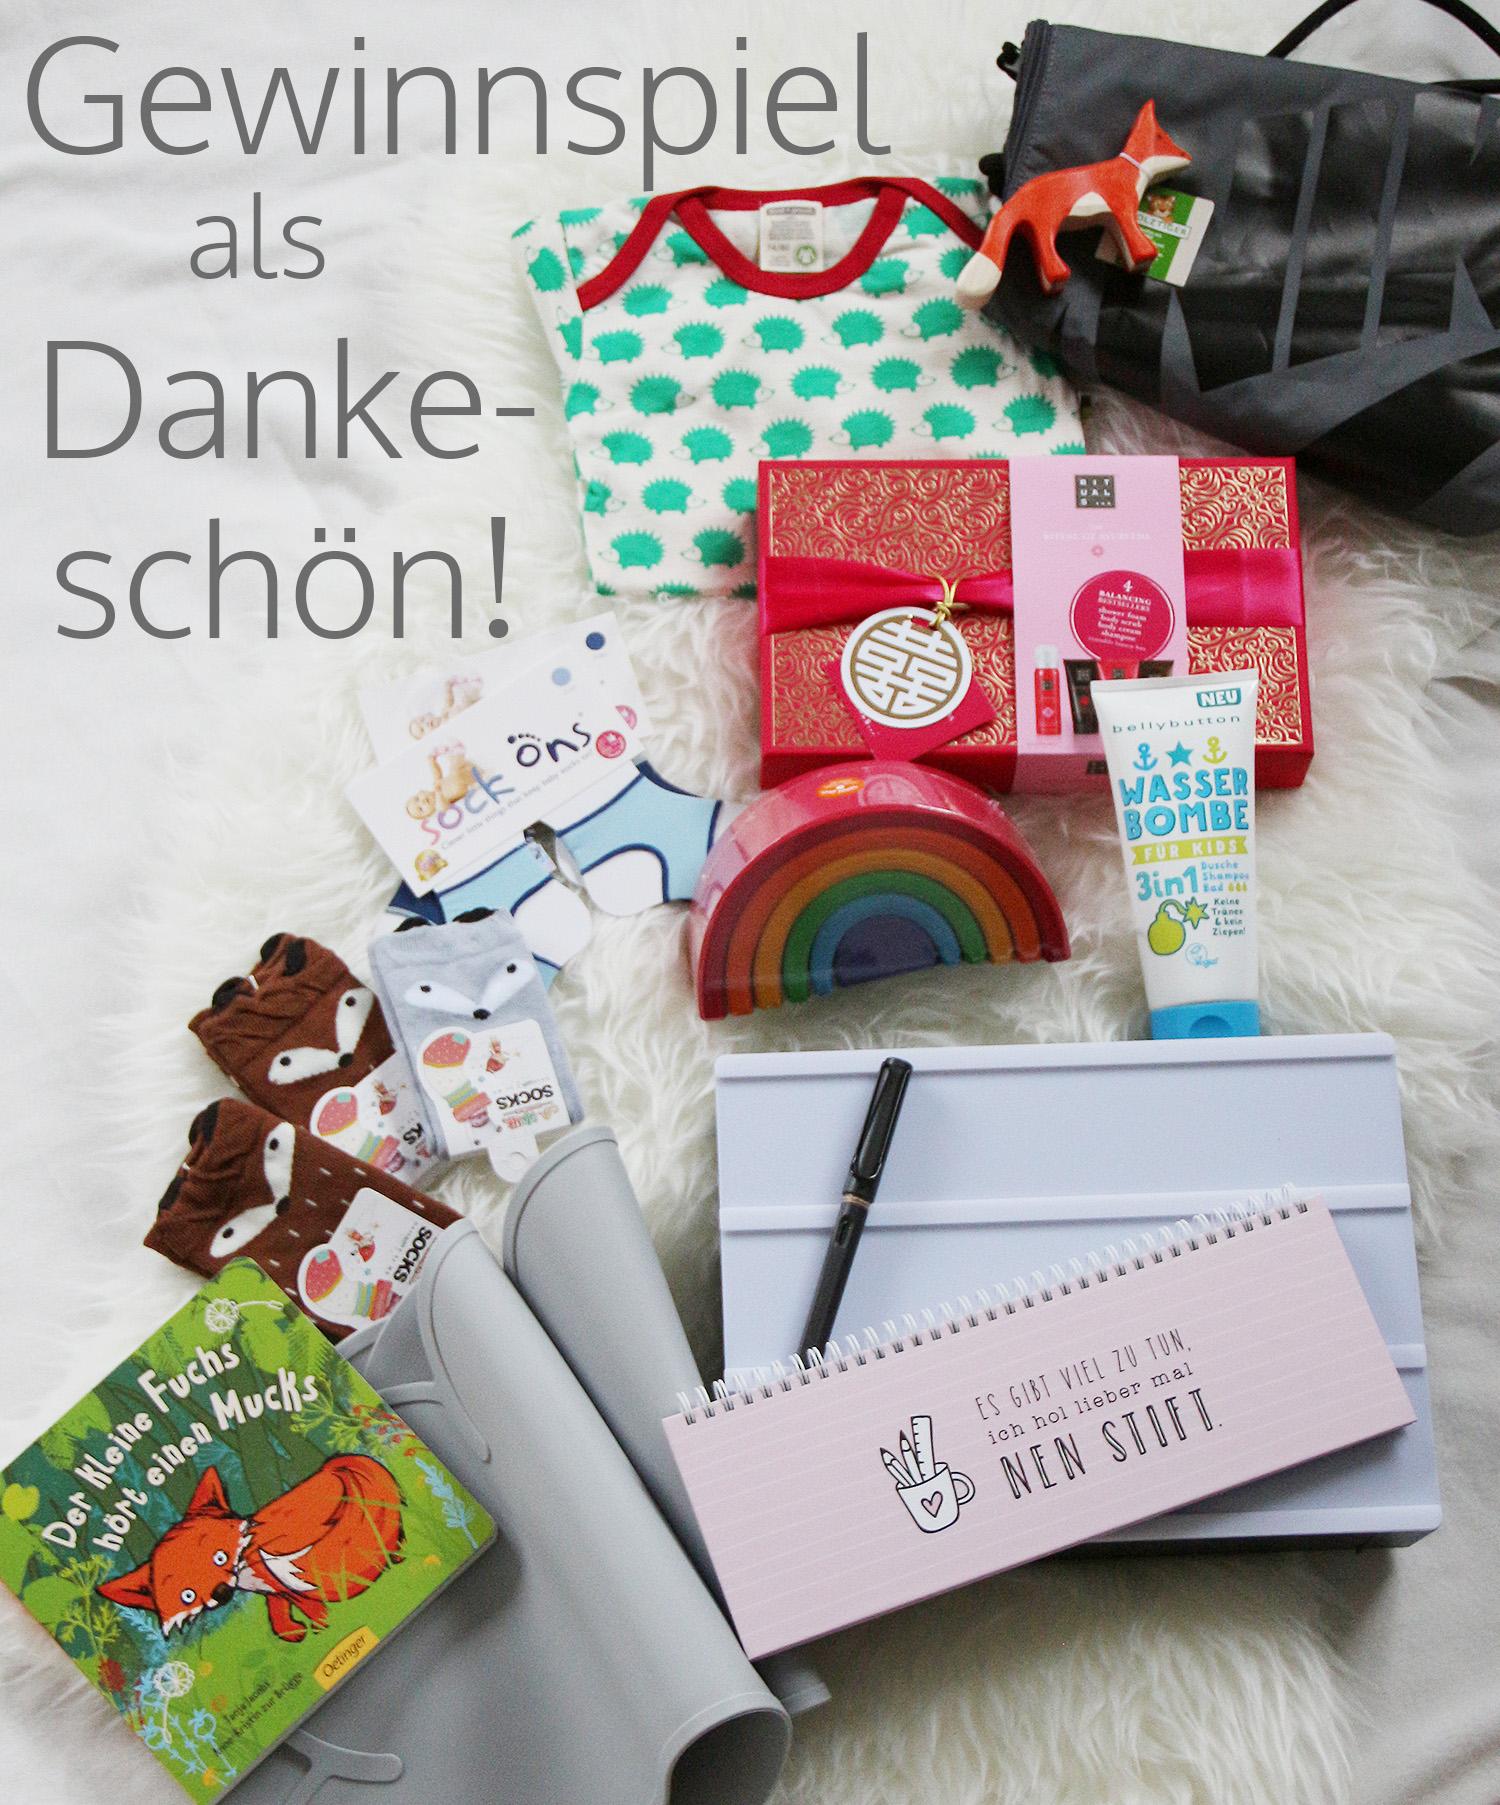 Leben-Lieben-Larifari.de - Dankeschön-Gewinnspiel!